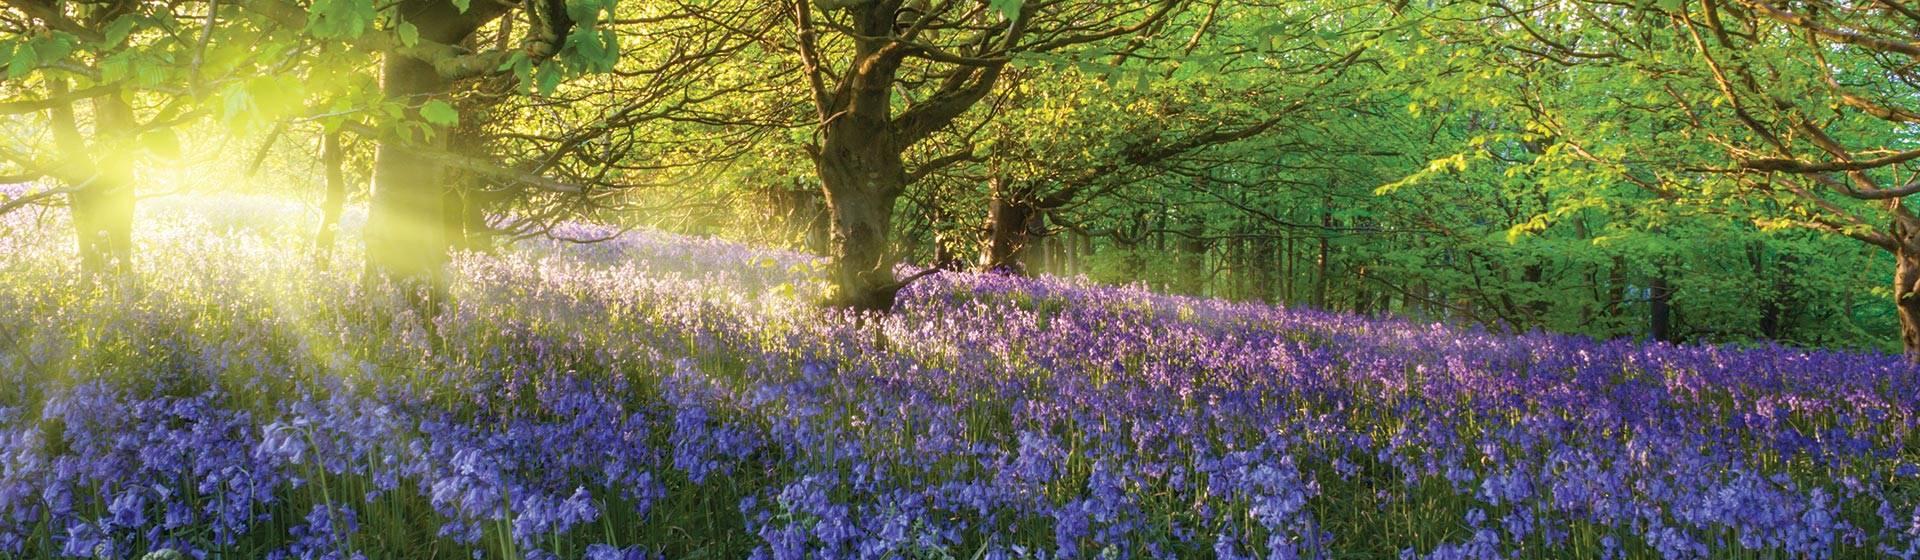 Easter Bluebells at Kew Gardens 2022